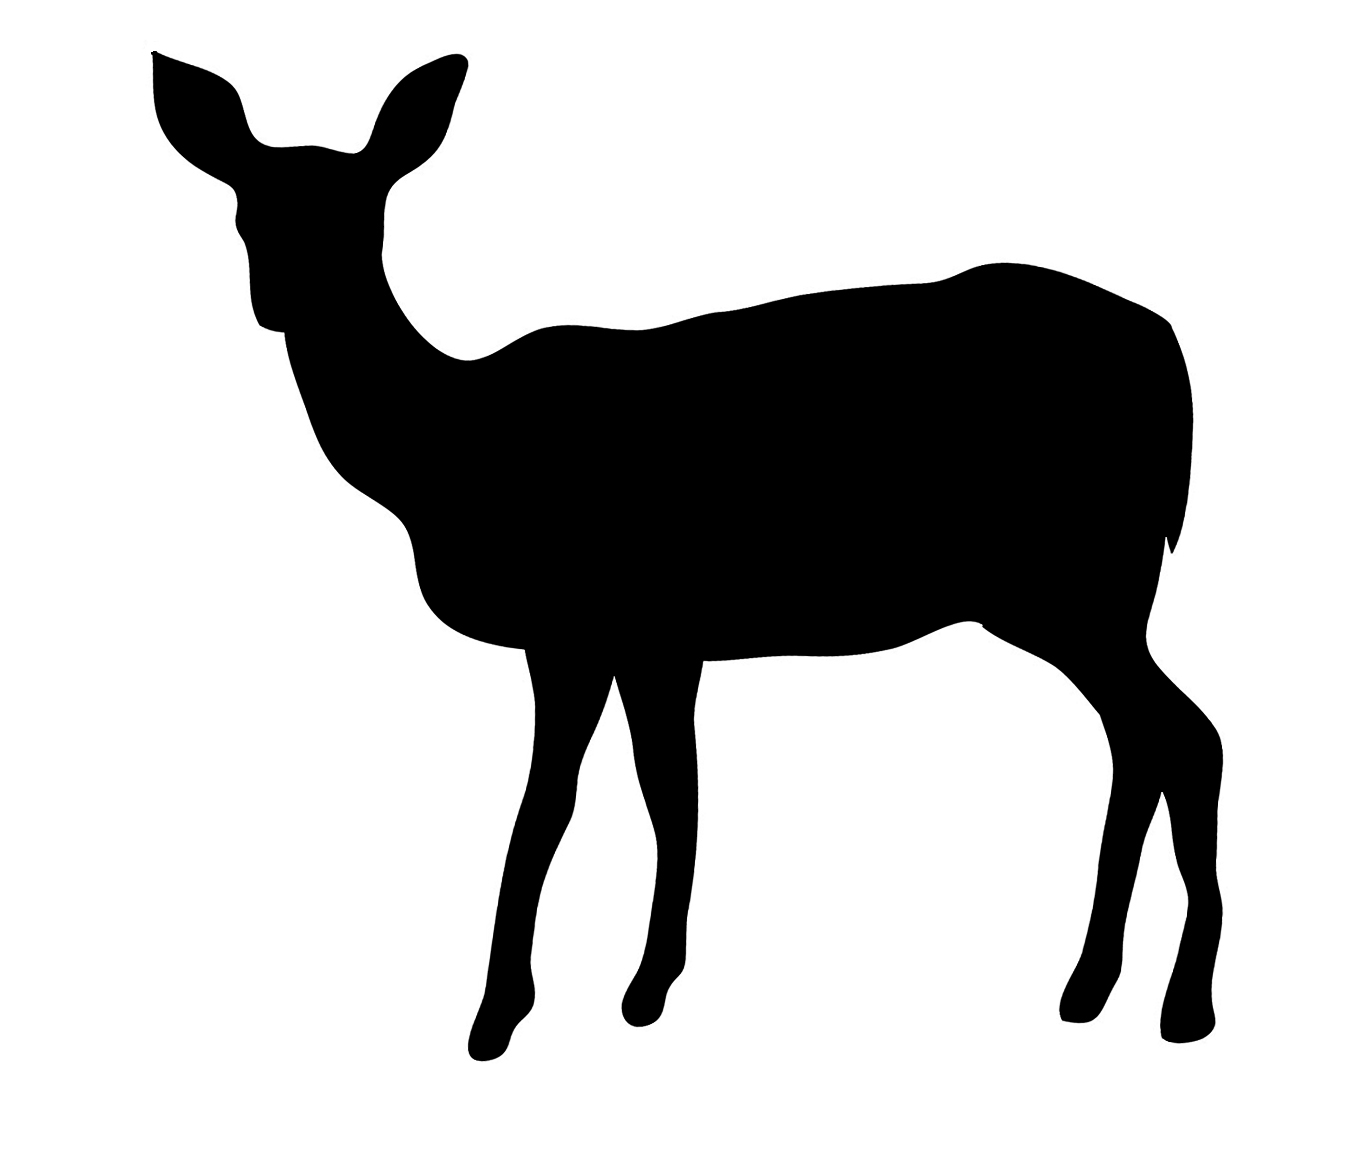 1349x1173 Free Deer Silhouette Download Clip Art On Fair Clipart